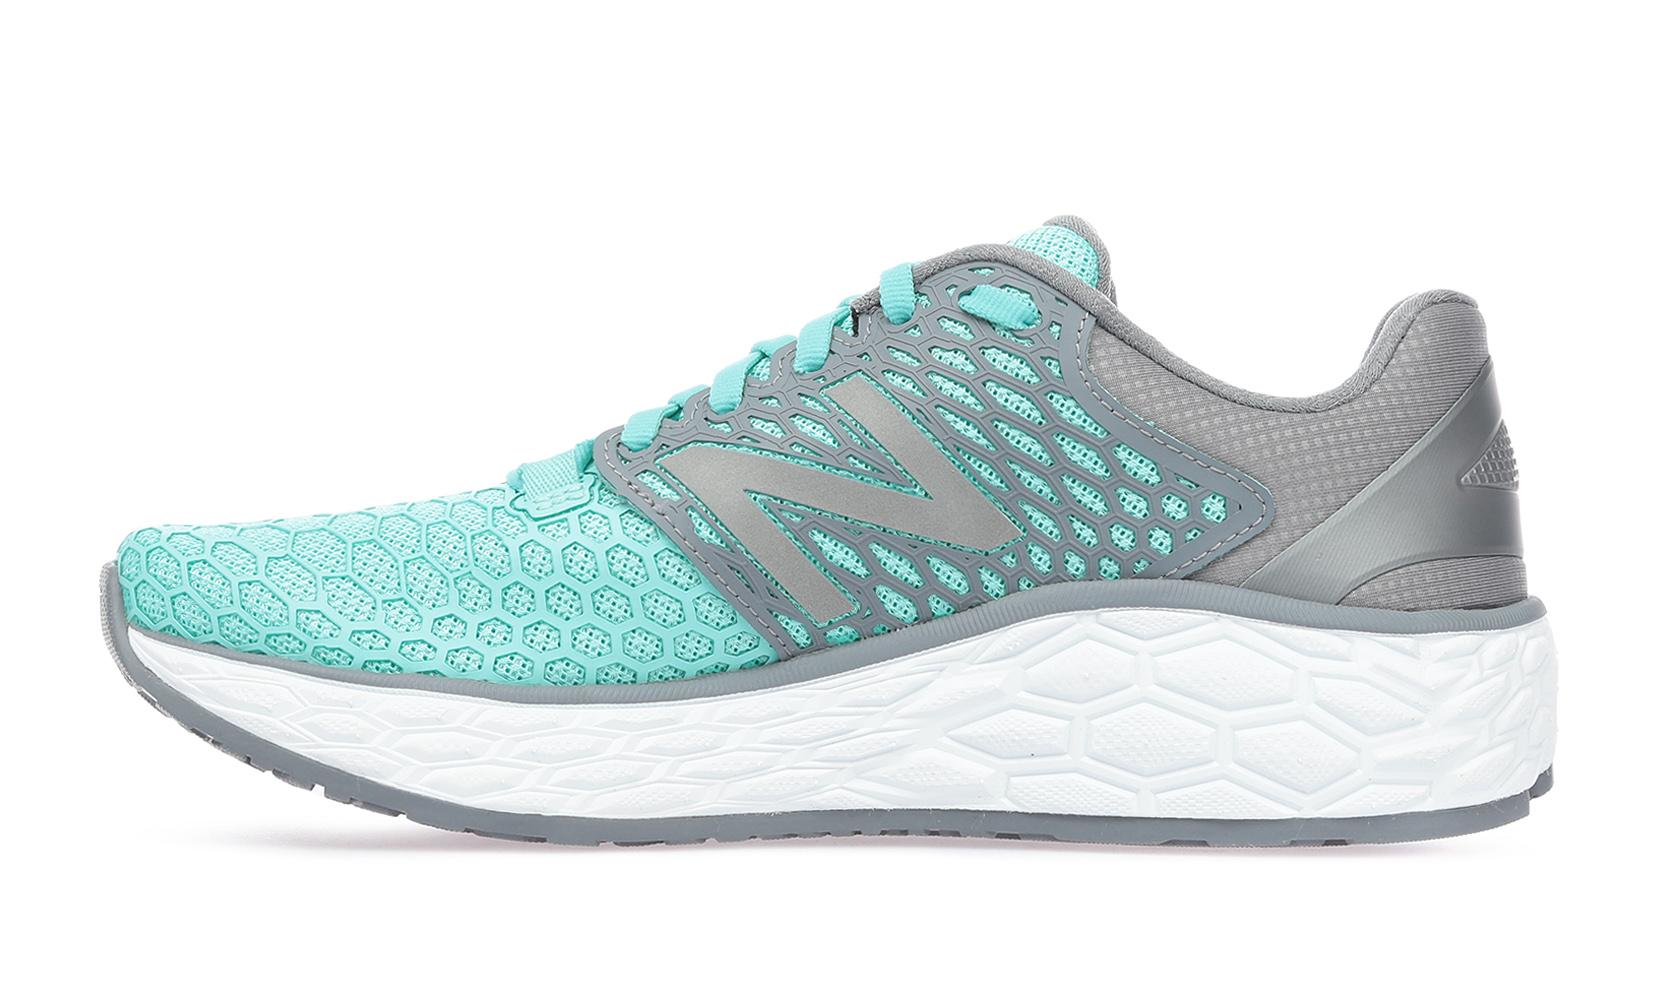 Жіноче взуття для тренувань New Balance Fresh Foam Vongo v3 WVNGOTP3 | New Balance